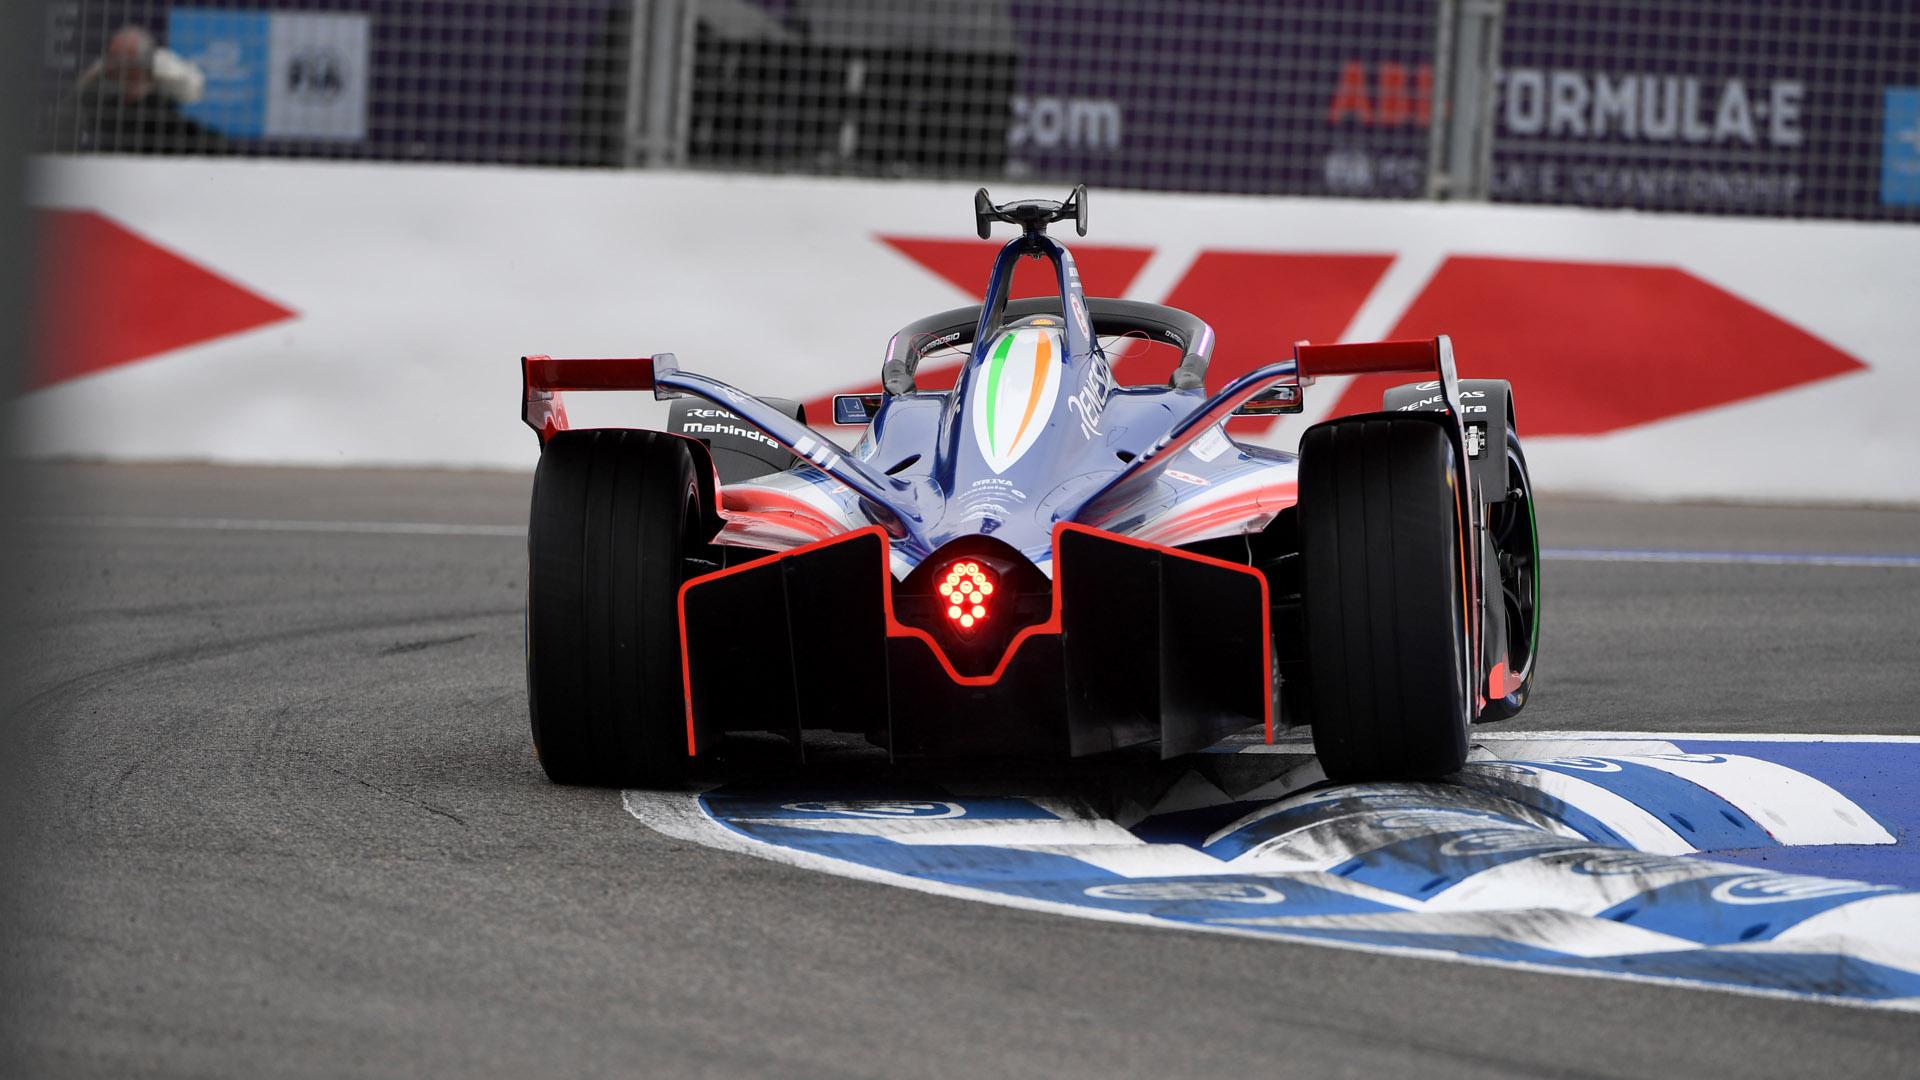 Formula E racecar back